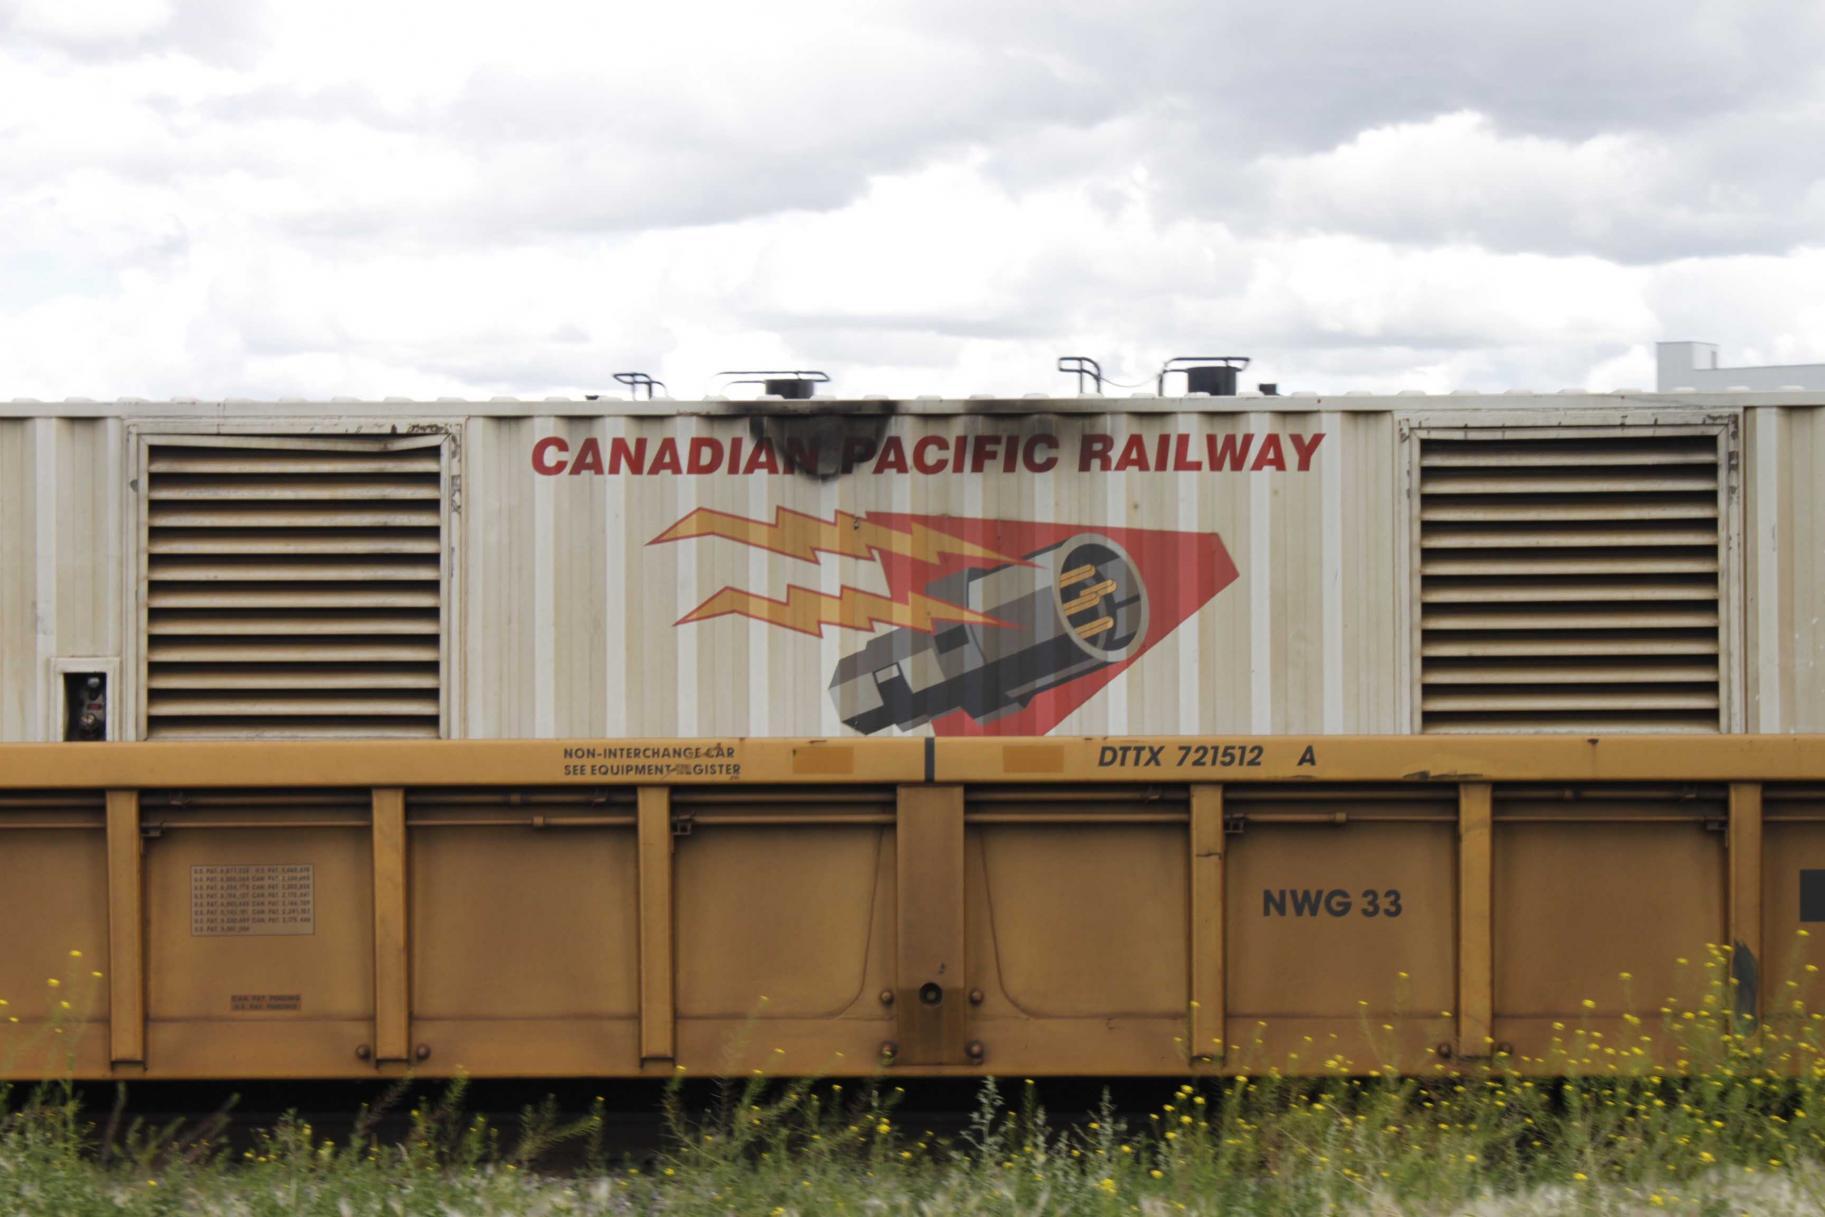 Canadian Pacific Railway Generator.jpg